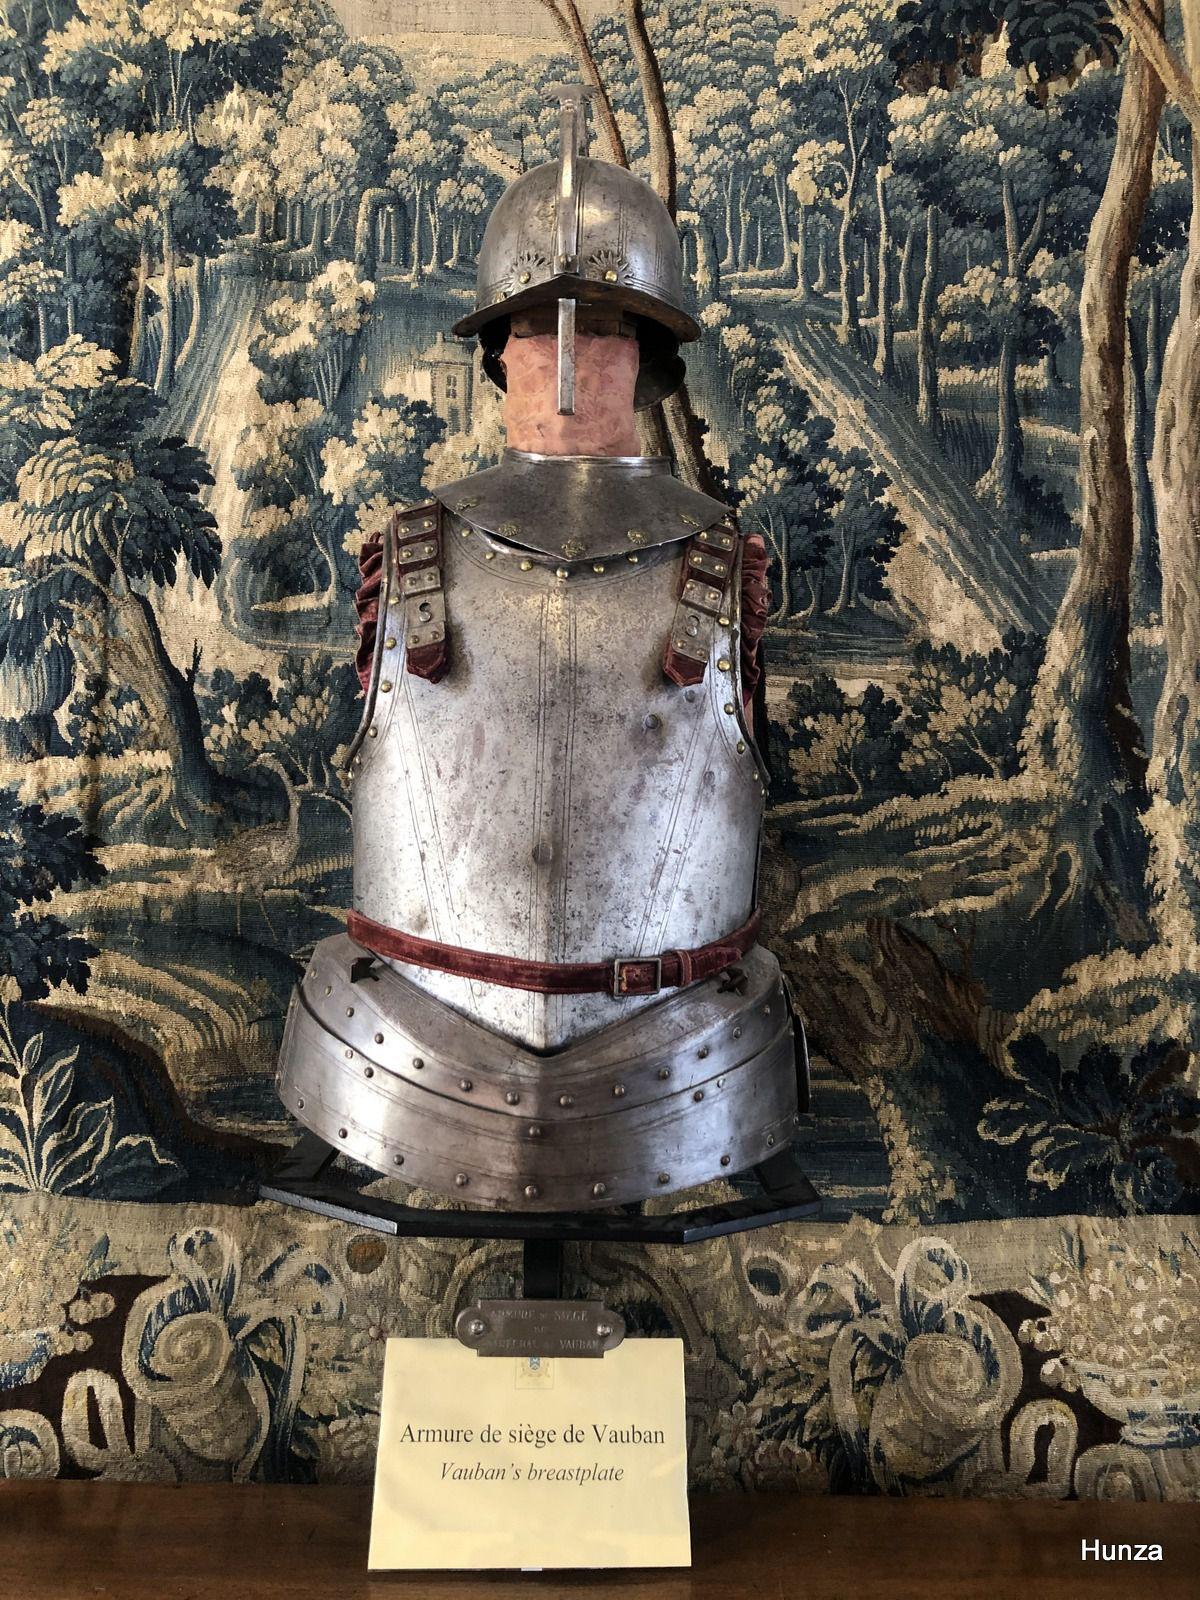 Château de Bazoches, armure de Vauban